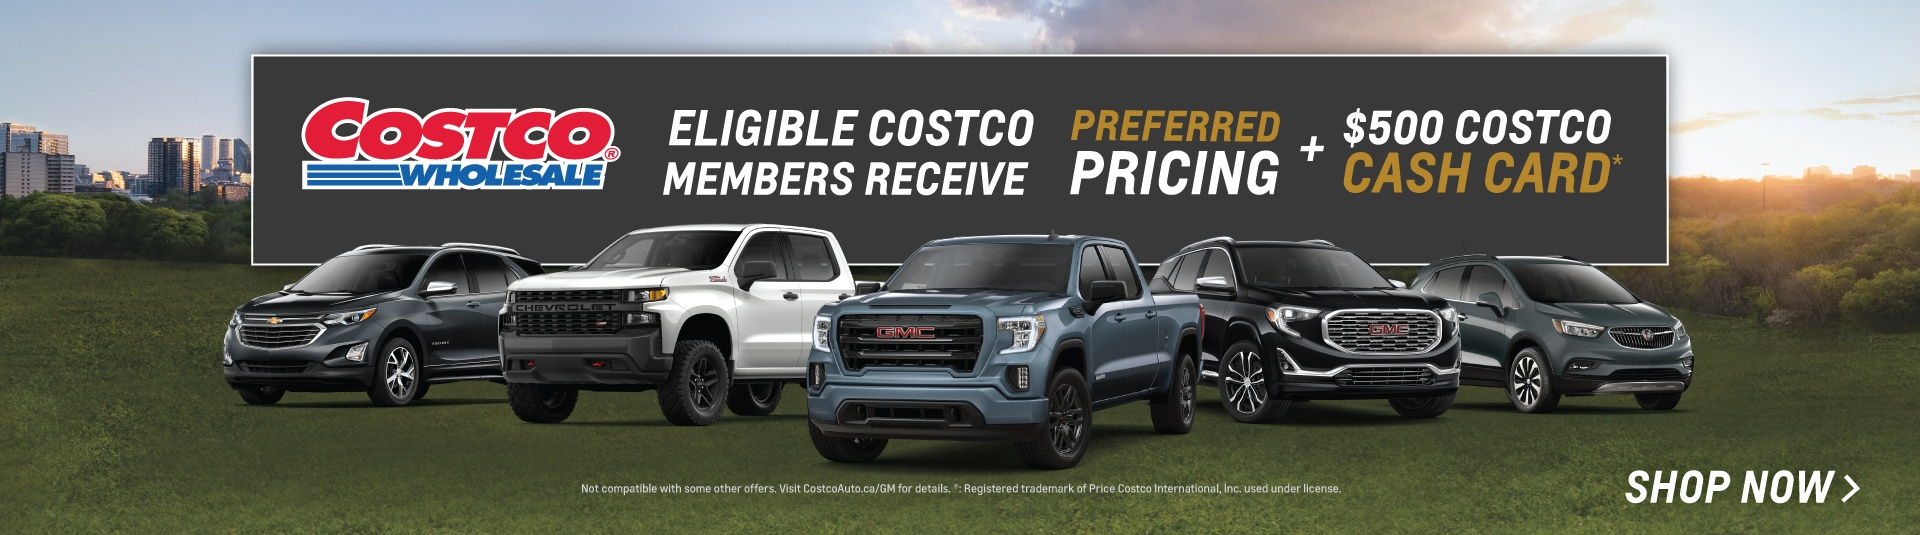 Humberview GM Costco Preferred Pricing Event In Etobicoke